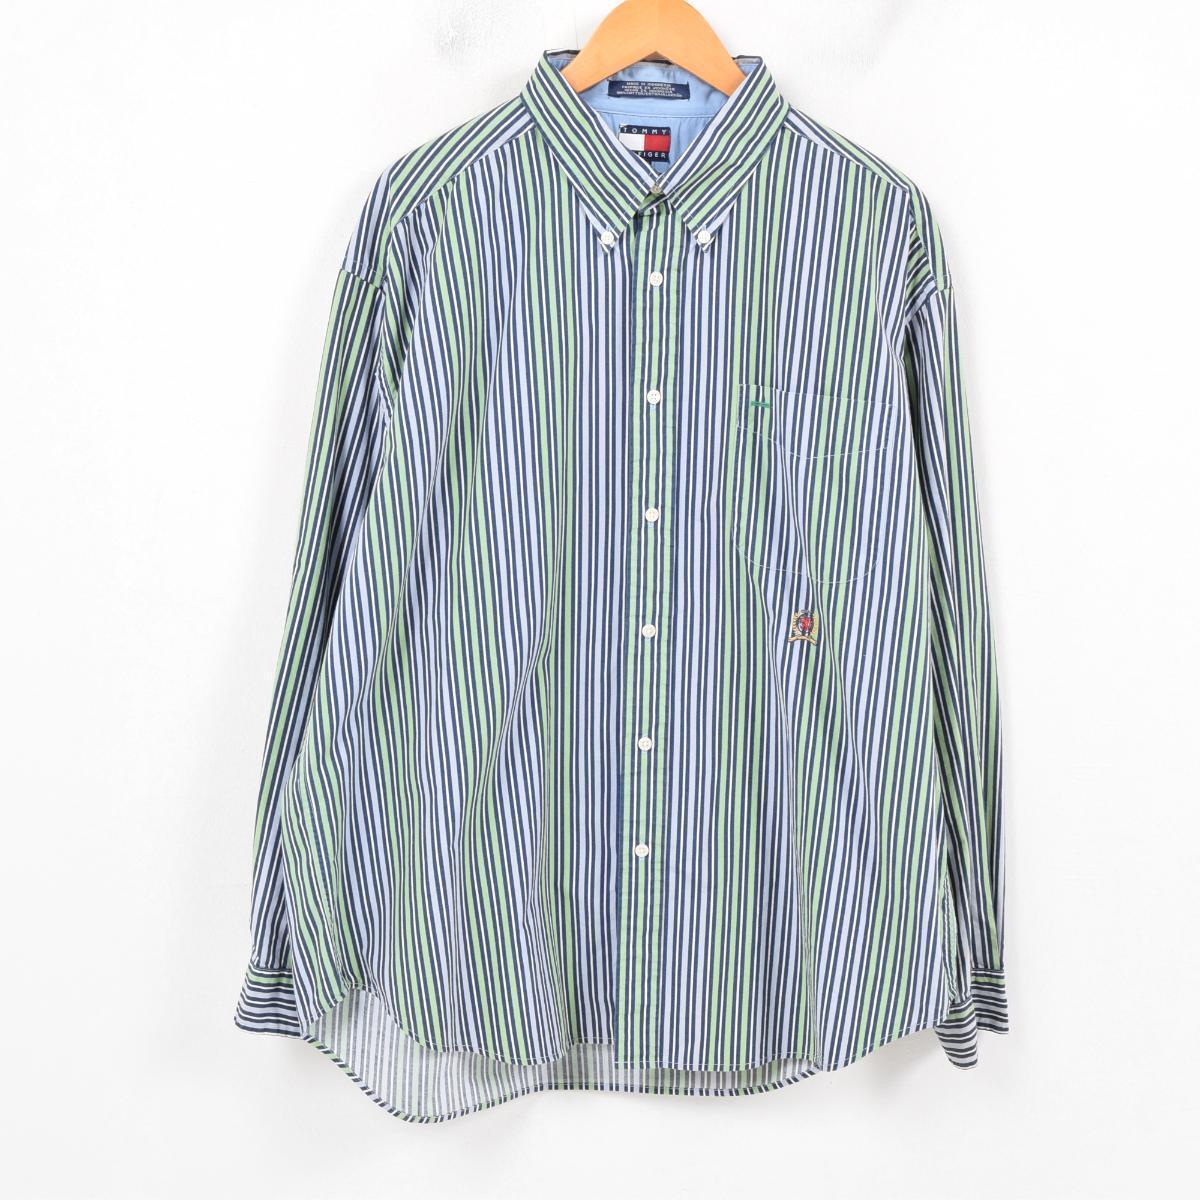 770076c9f5 90s トミーヒルフィガー TOMMY HILFIGER multi-stripe long sleeves stripe shirt men XL  /wap8169 ...